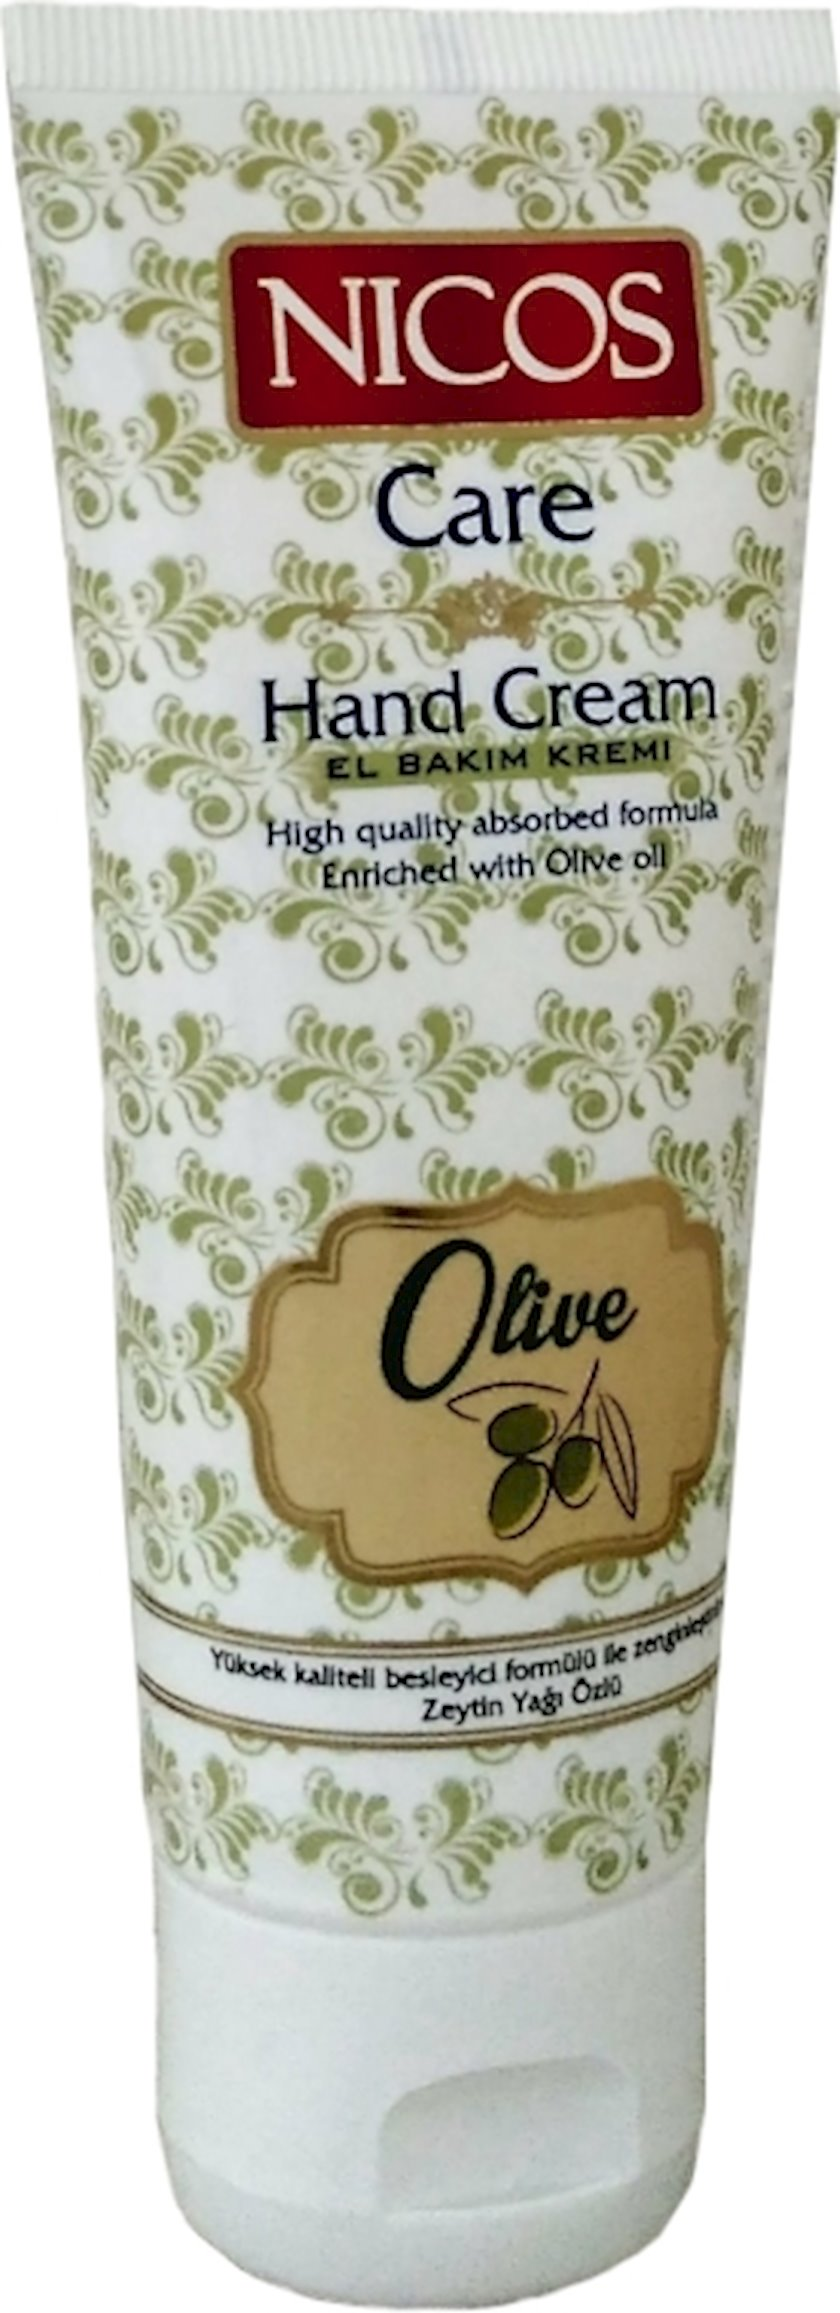 Əl kremi Nicos Olive Oil, 75 ml